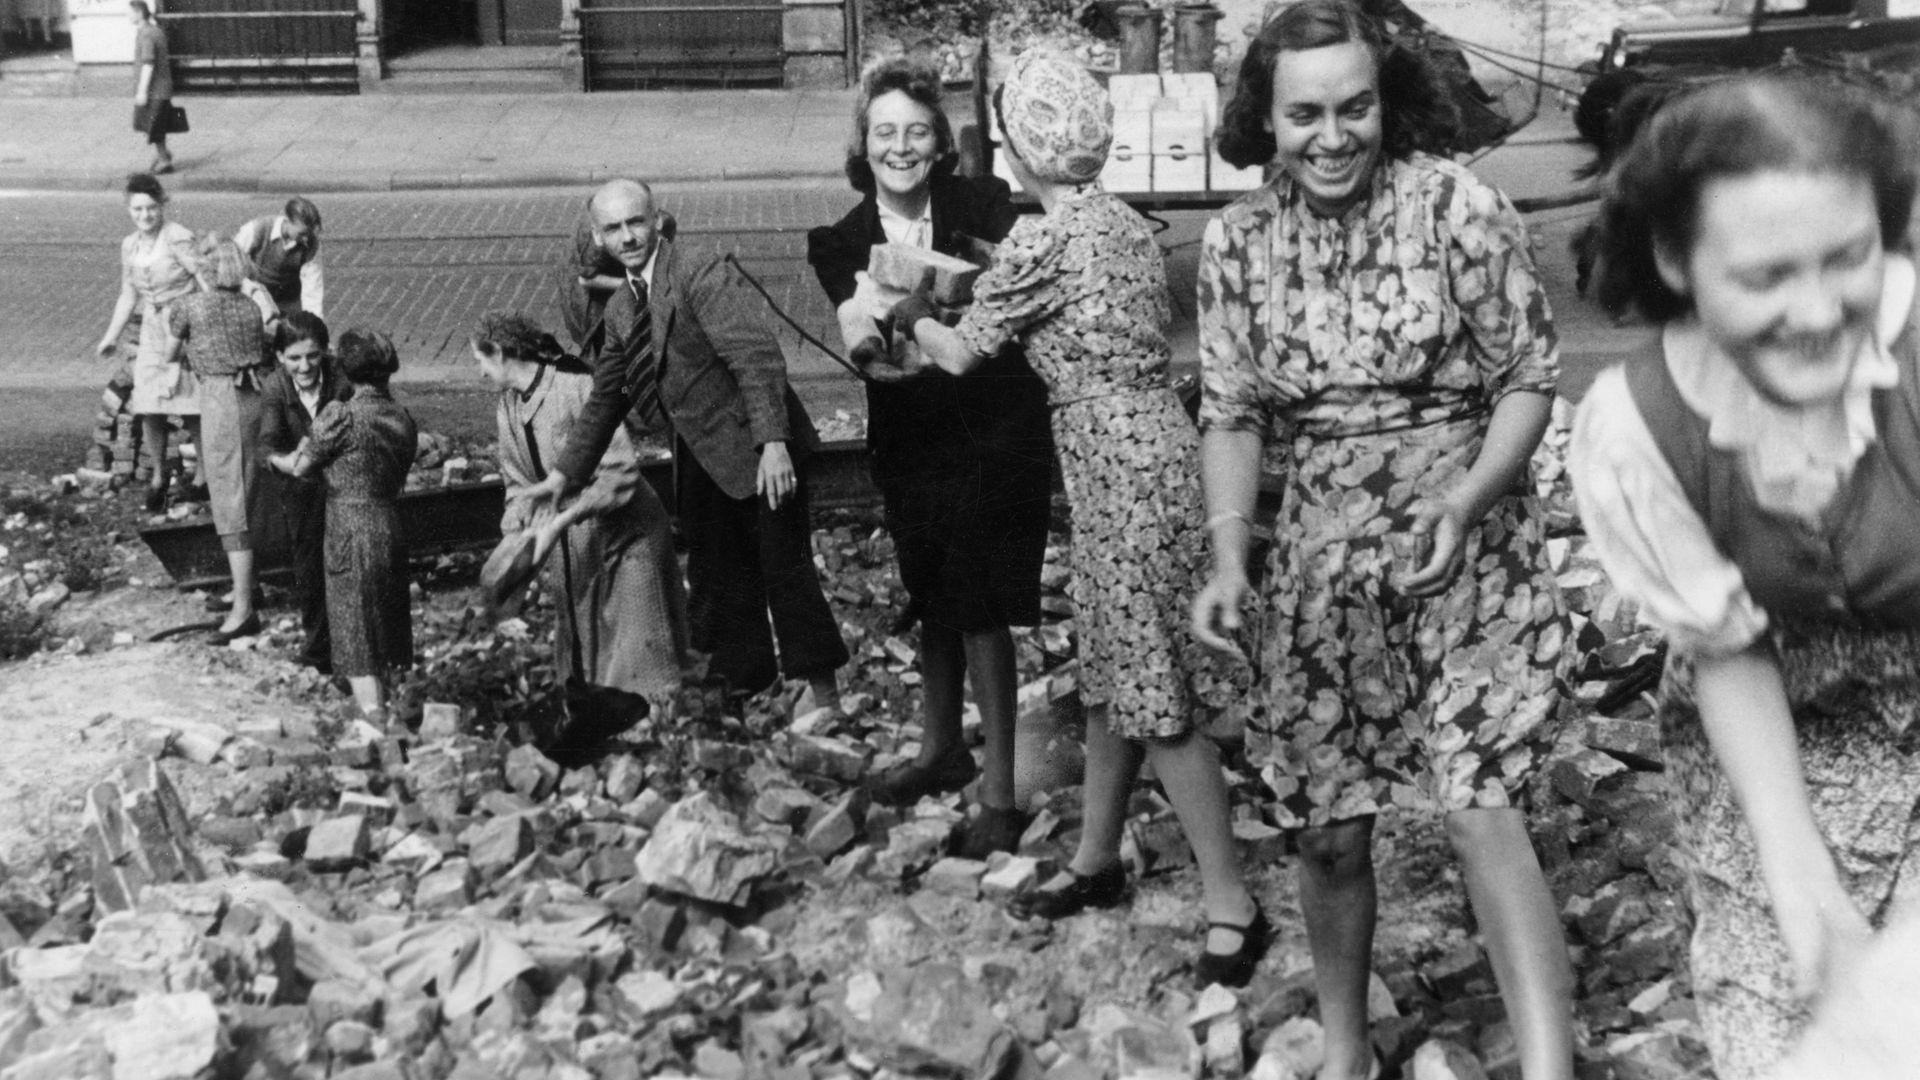 Trümmerfrauen - literally 'rubble' women - at work as Germany's post-war rebuilding operation begins - Credit: Getty Images